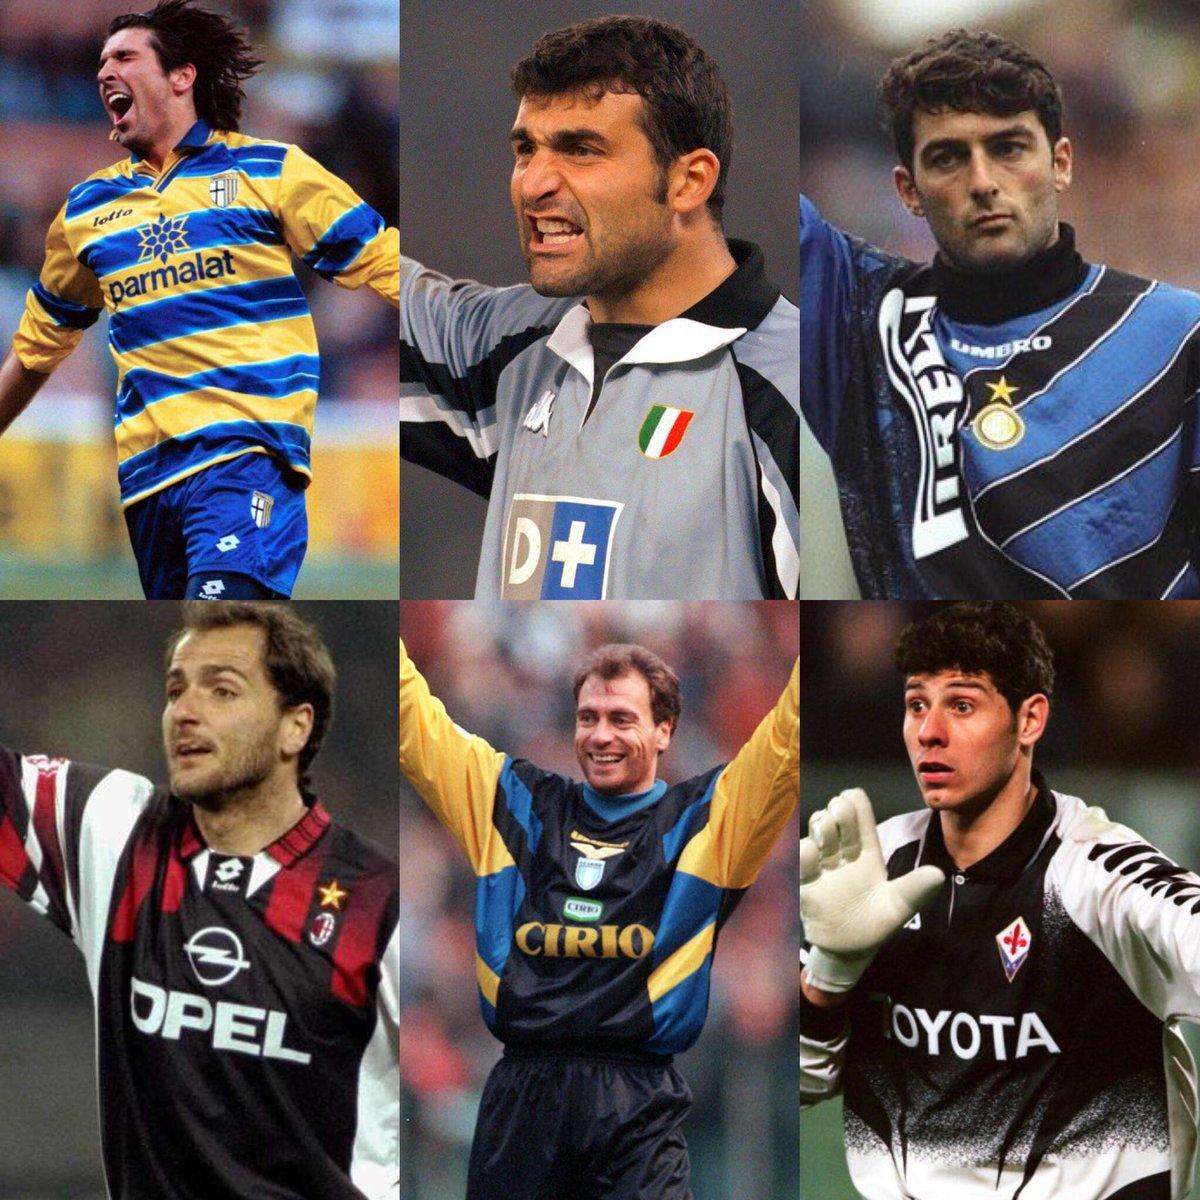 2018/19 Calcio Saga - Page 20 DlJrlZRW0AUZkSk